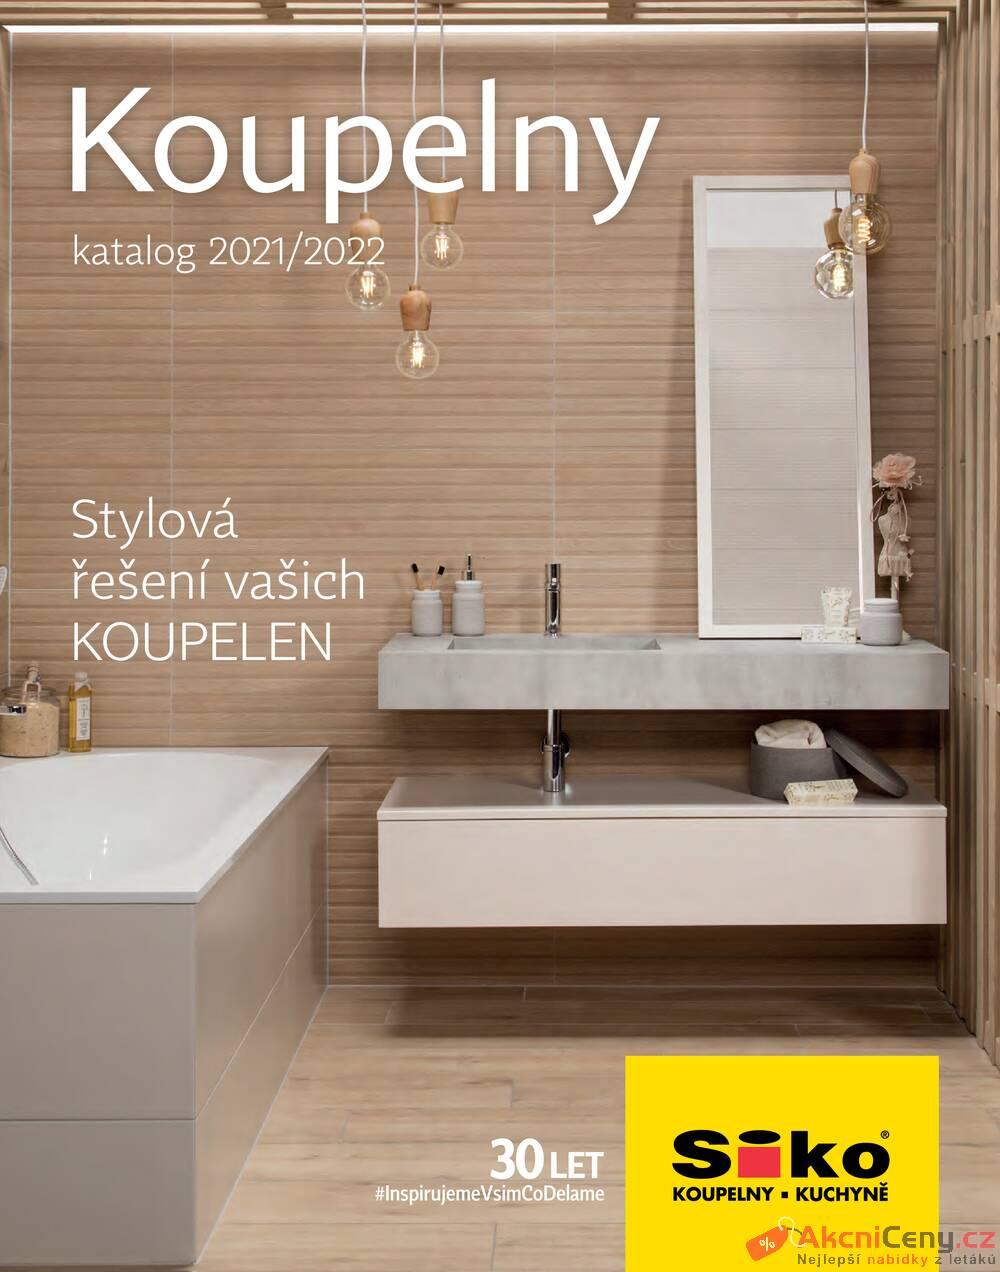 Leták Siko koupelny - Siko Katalog Koupelny 2021/2022 - strana 1